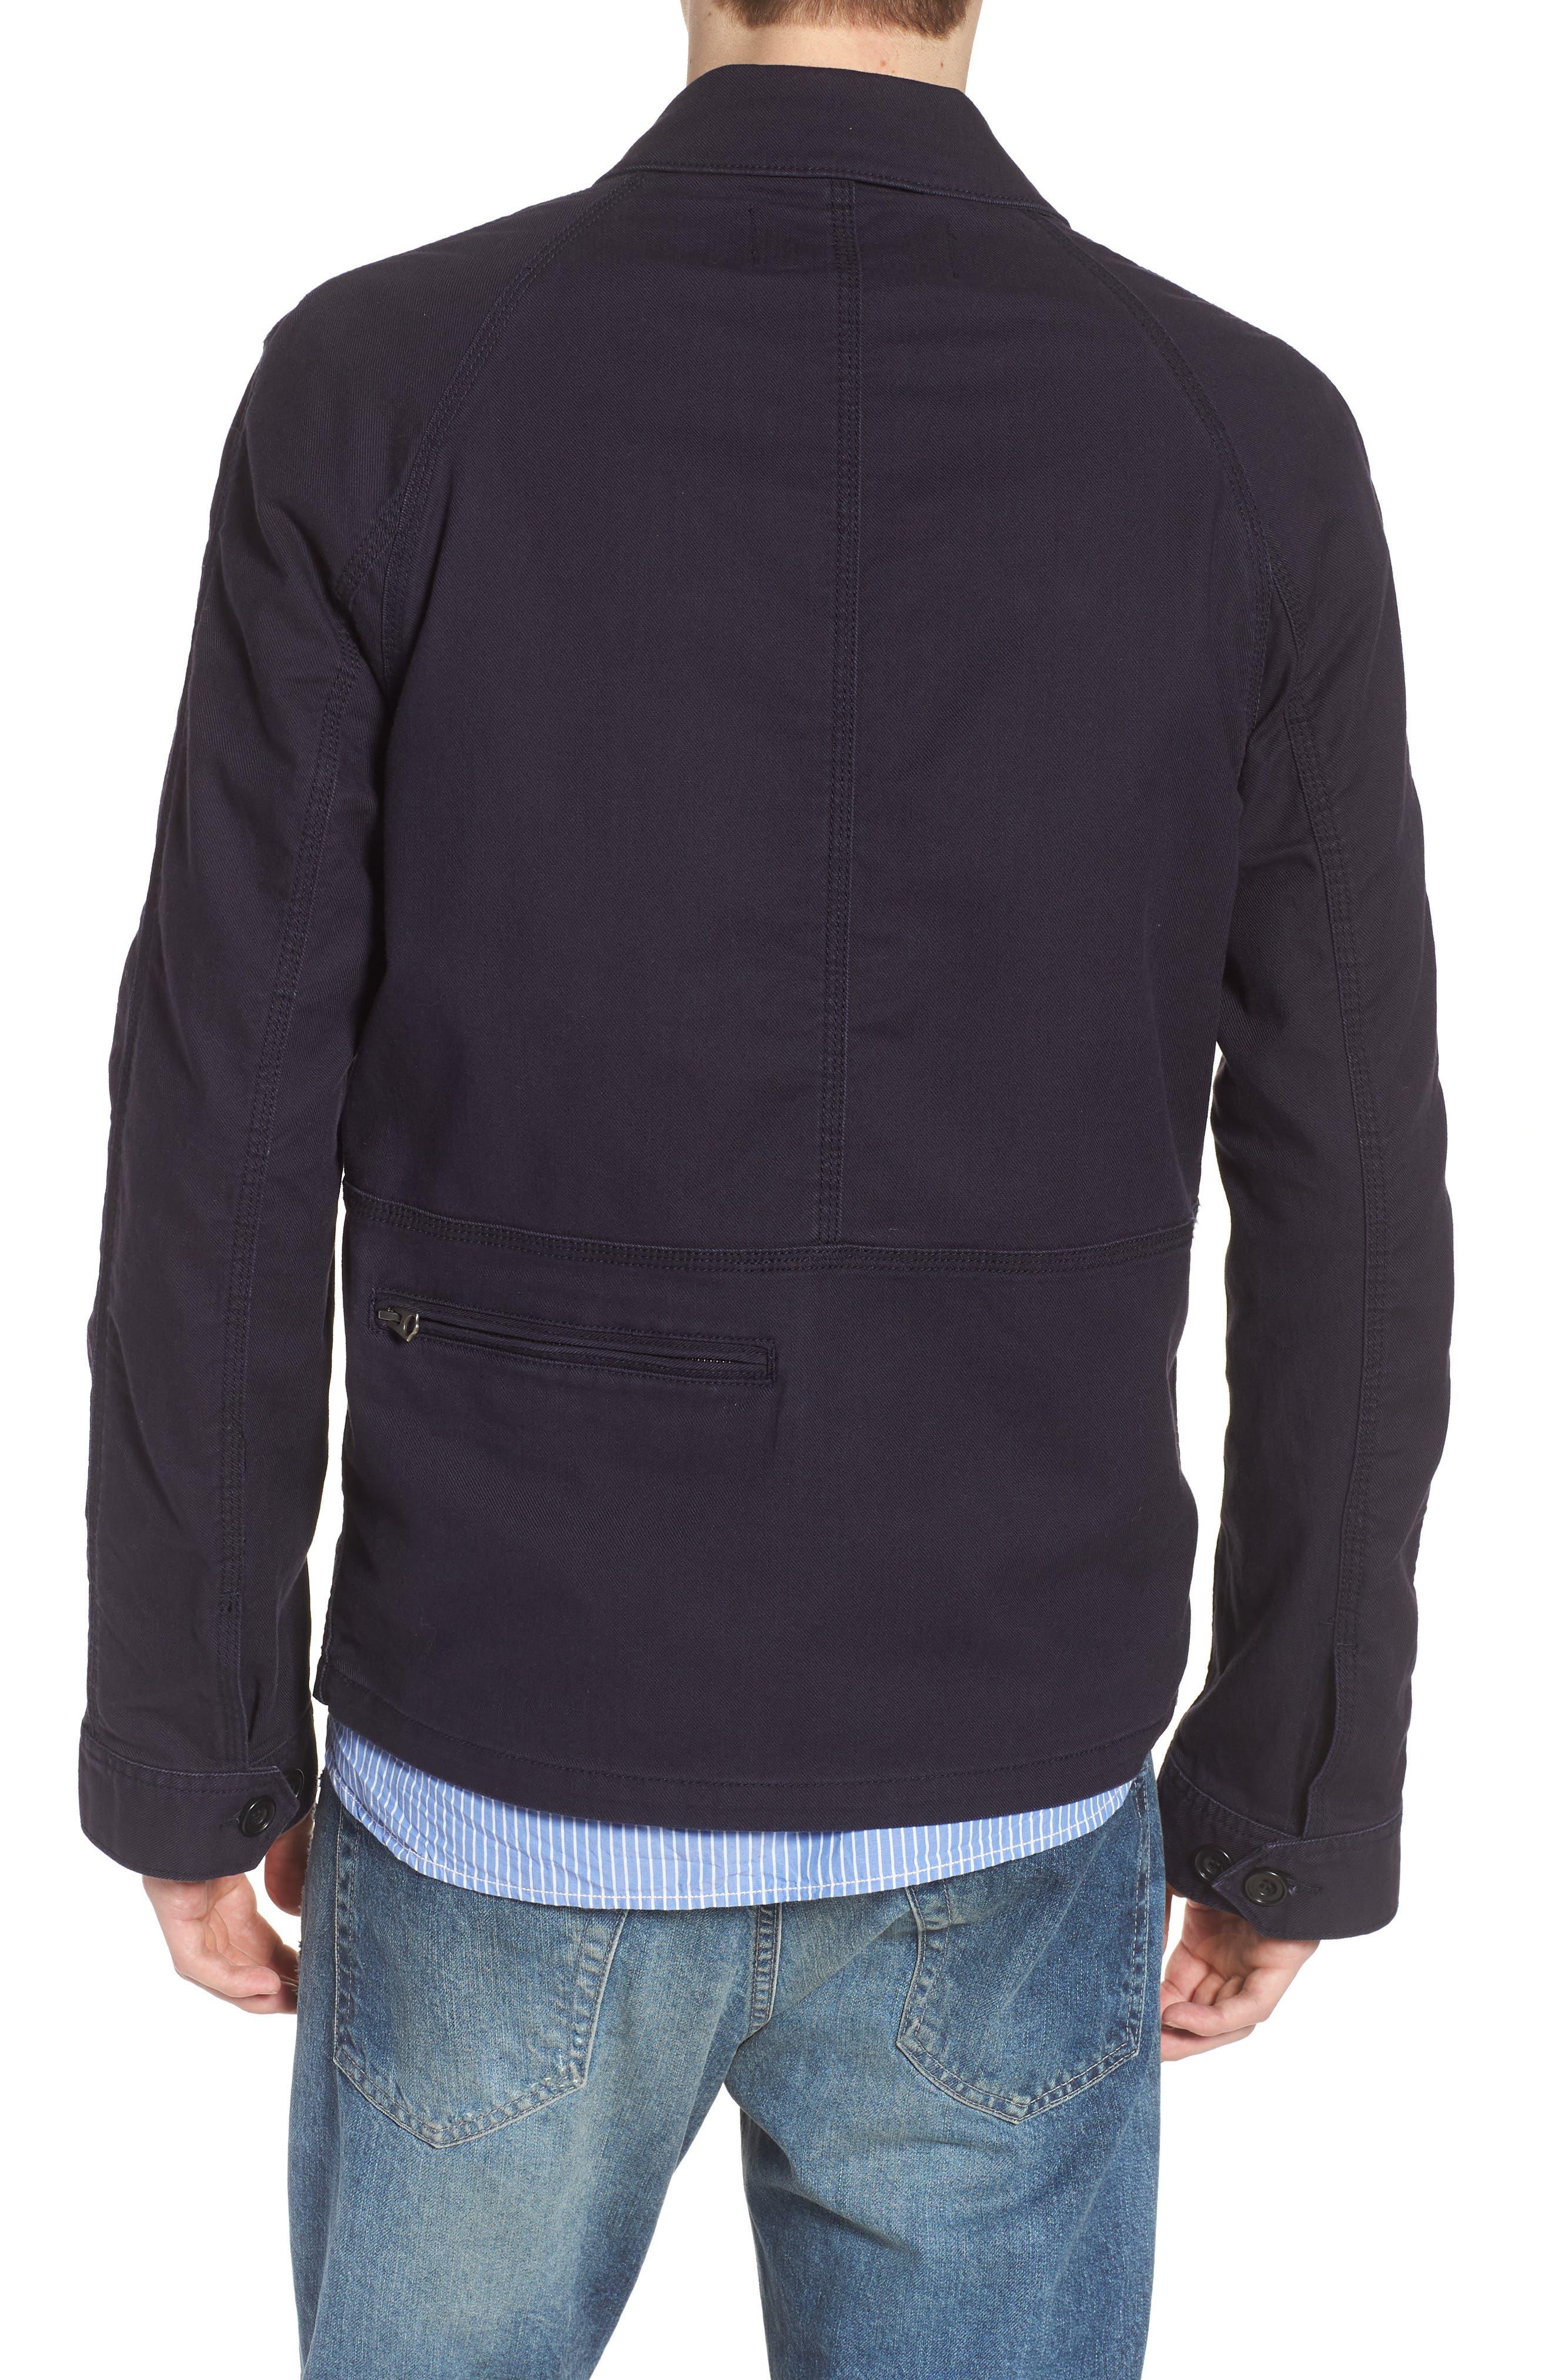 Slim Fit Slub Twill Cotton & Linen Jacket,                             Alternate thumbnail 2, color,                             001